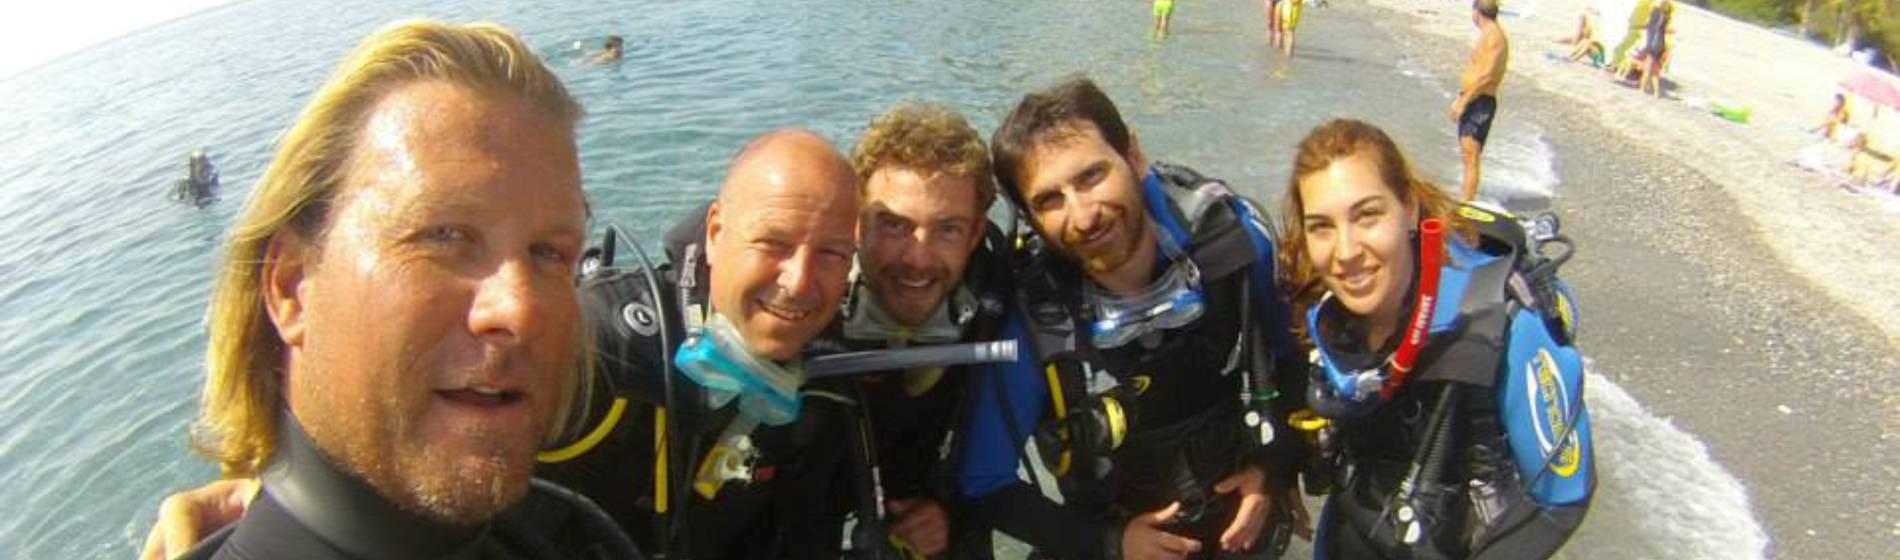 scuba diving, scuba diving school in malaga